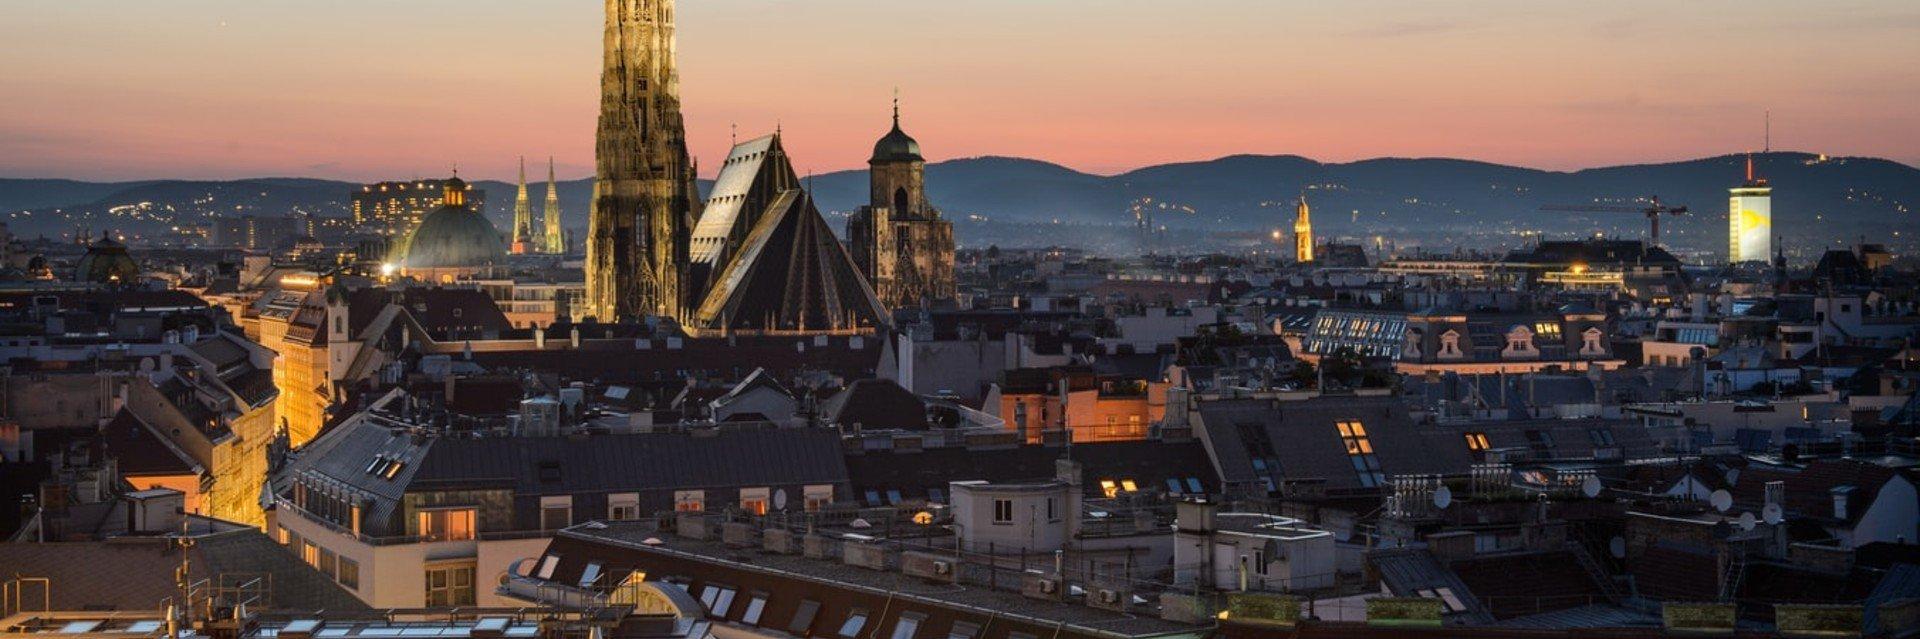 2022 Oberammergau Passion Play Pilgrimage with Poland & Austria